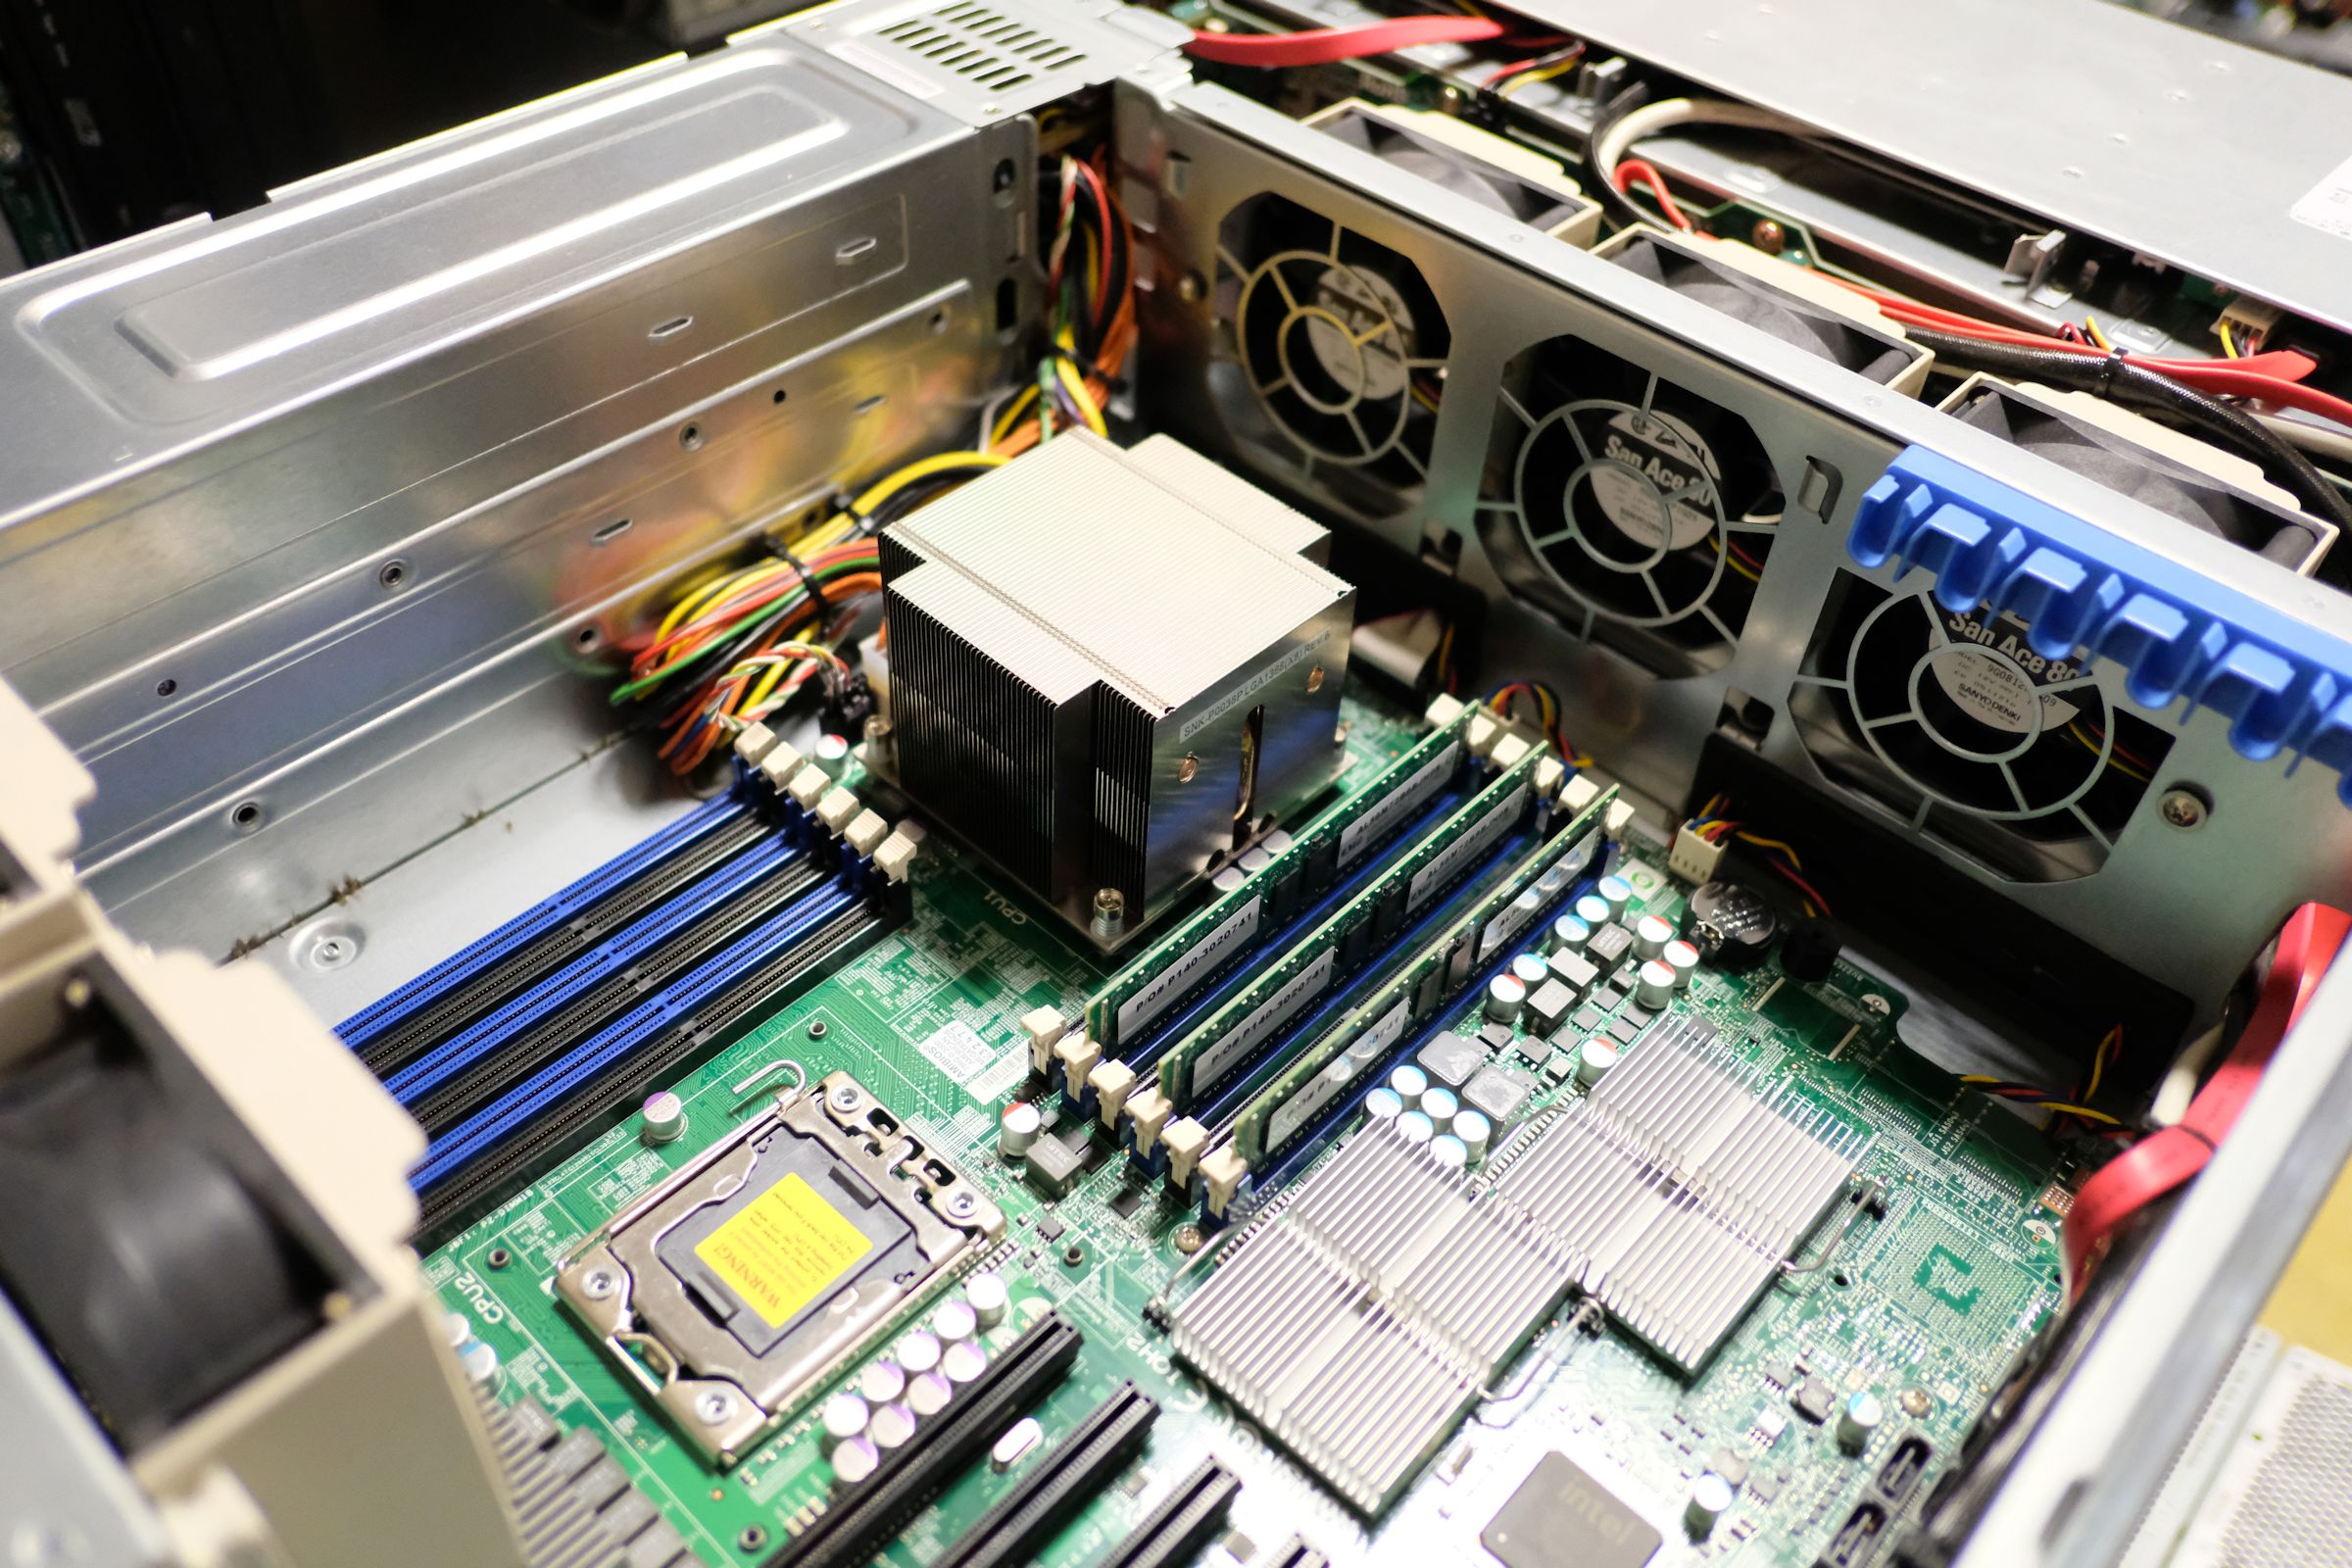 Dell Compellent Series C40 CT-040 Storage Enclosure